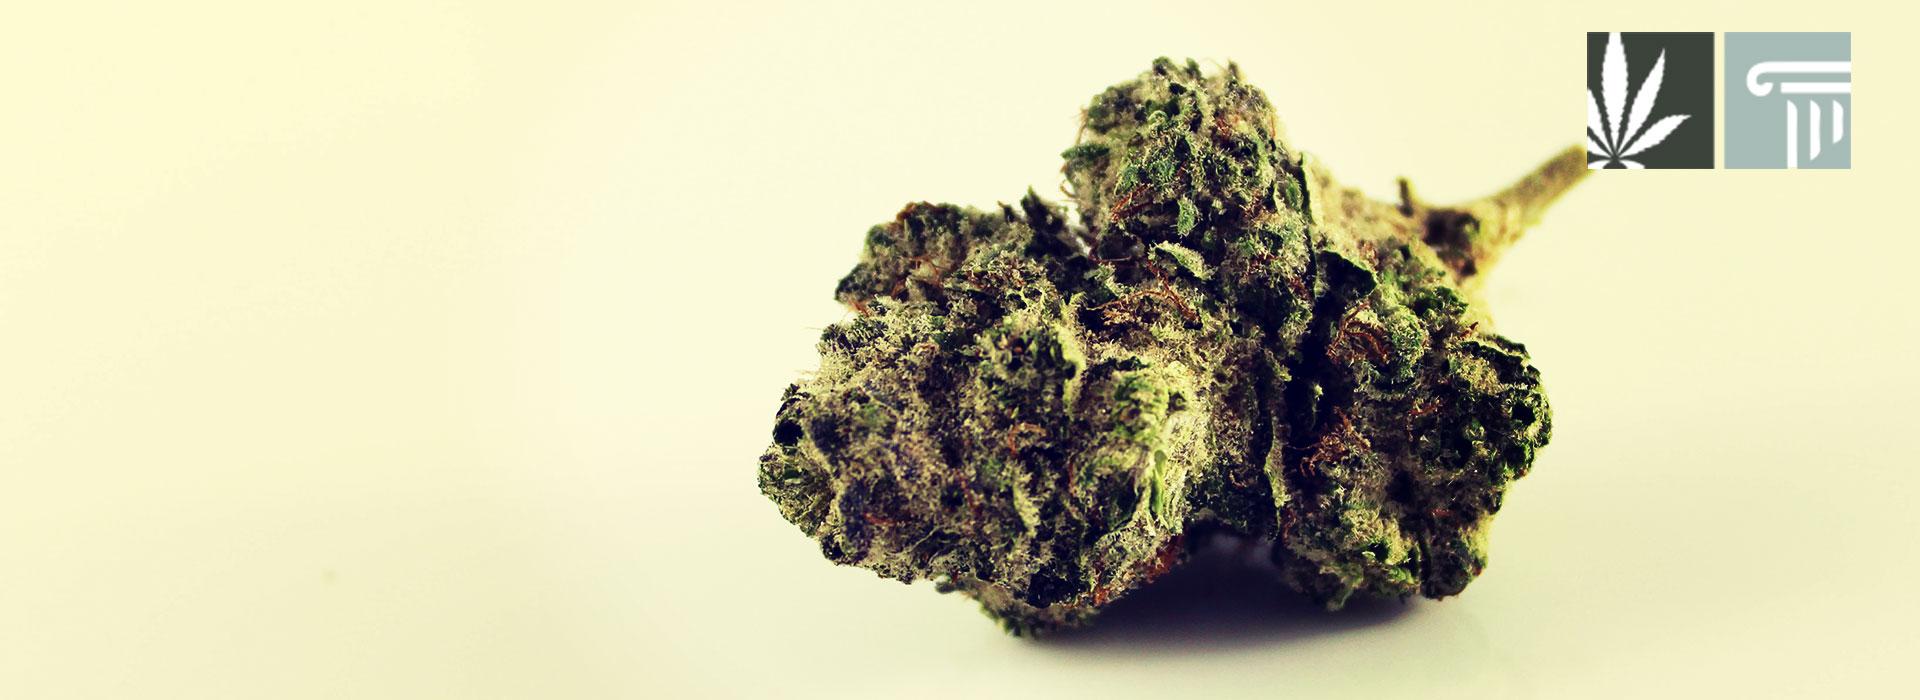 Pennsylvania medical marijuana employer tips